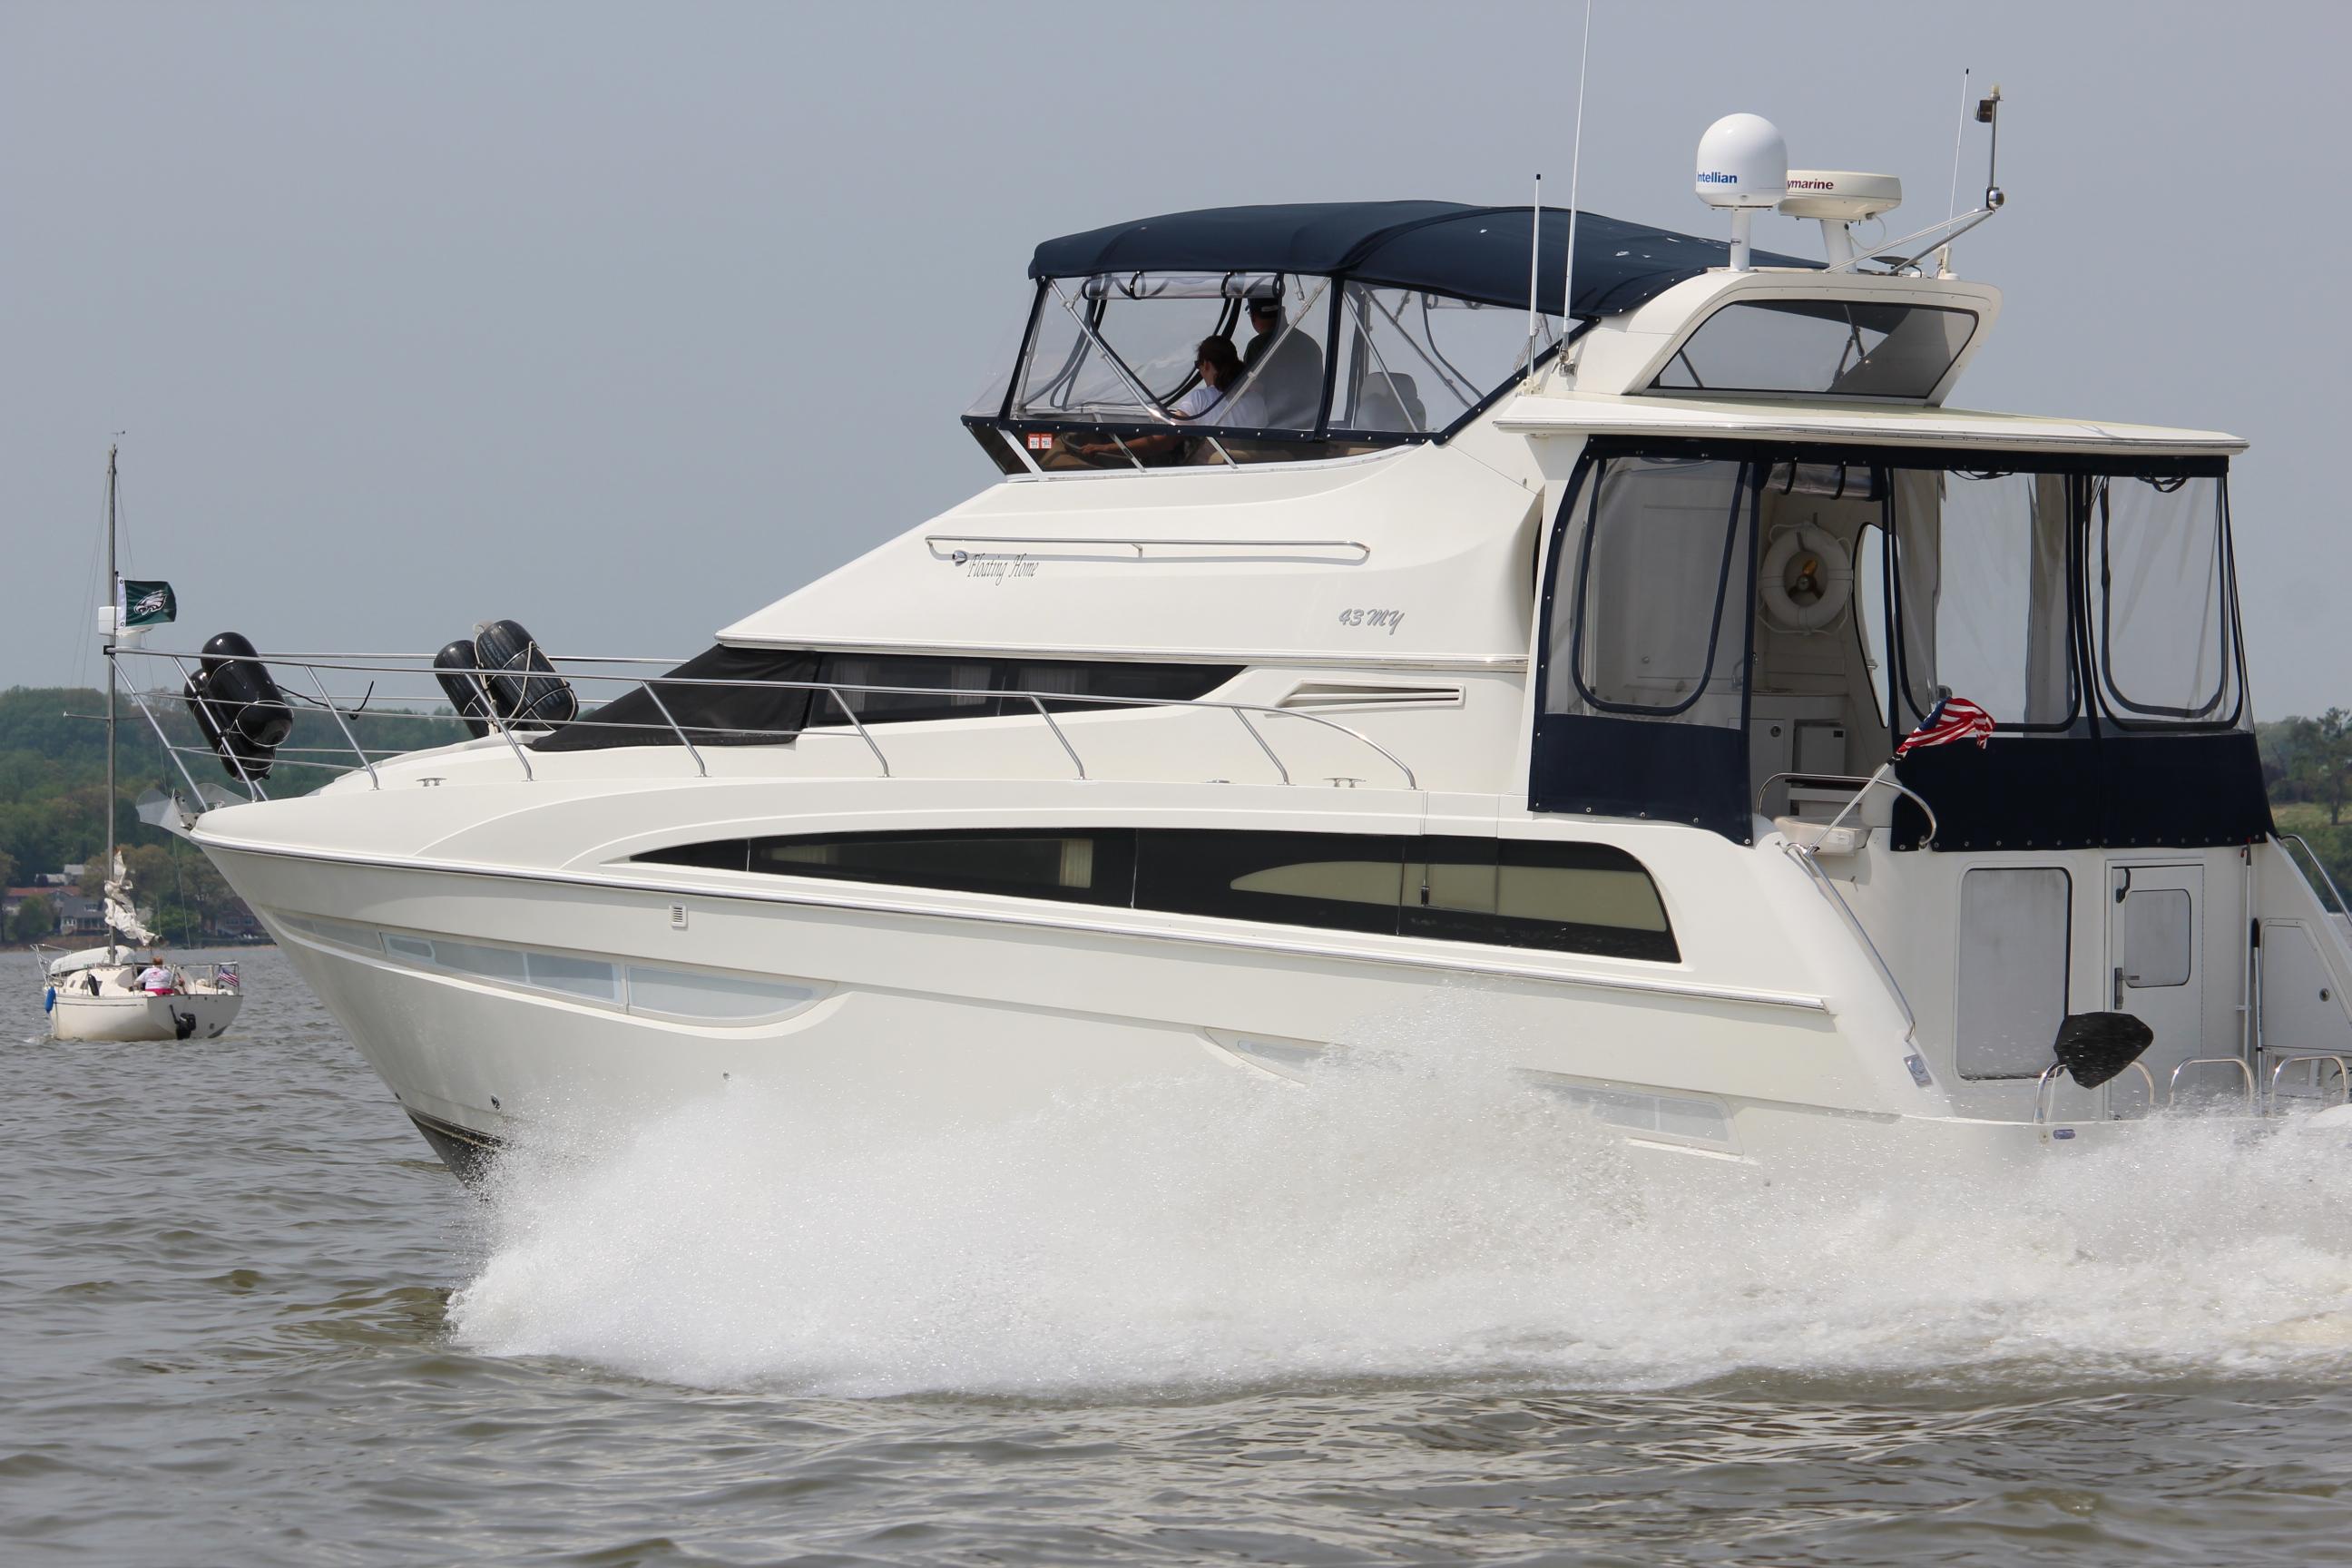 Carver 43MY motoring on the Chesapeake Bay